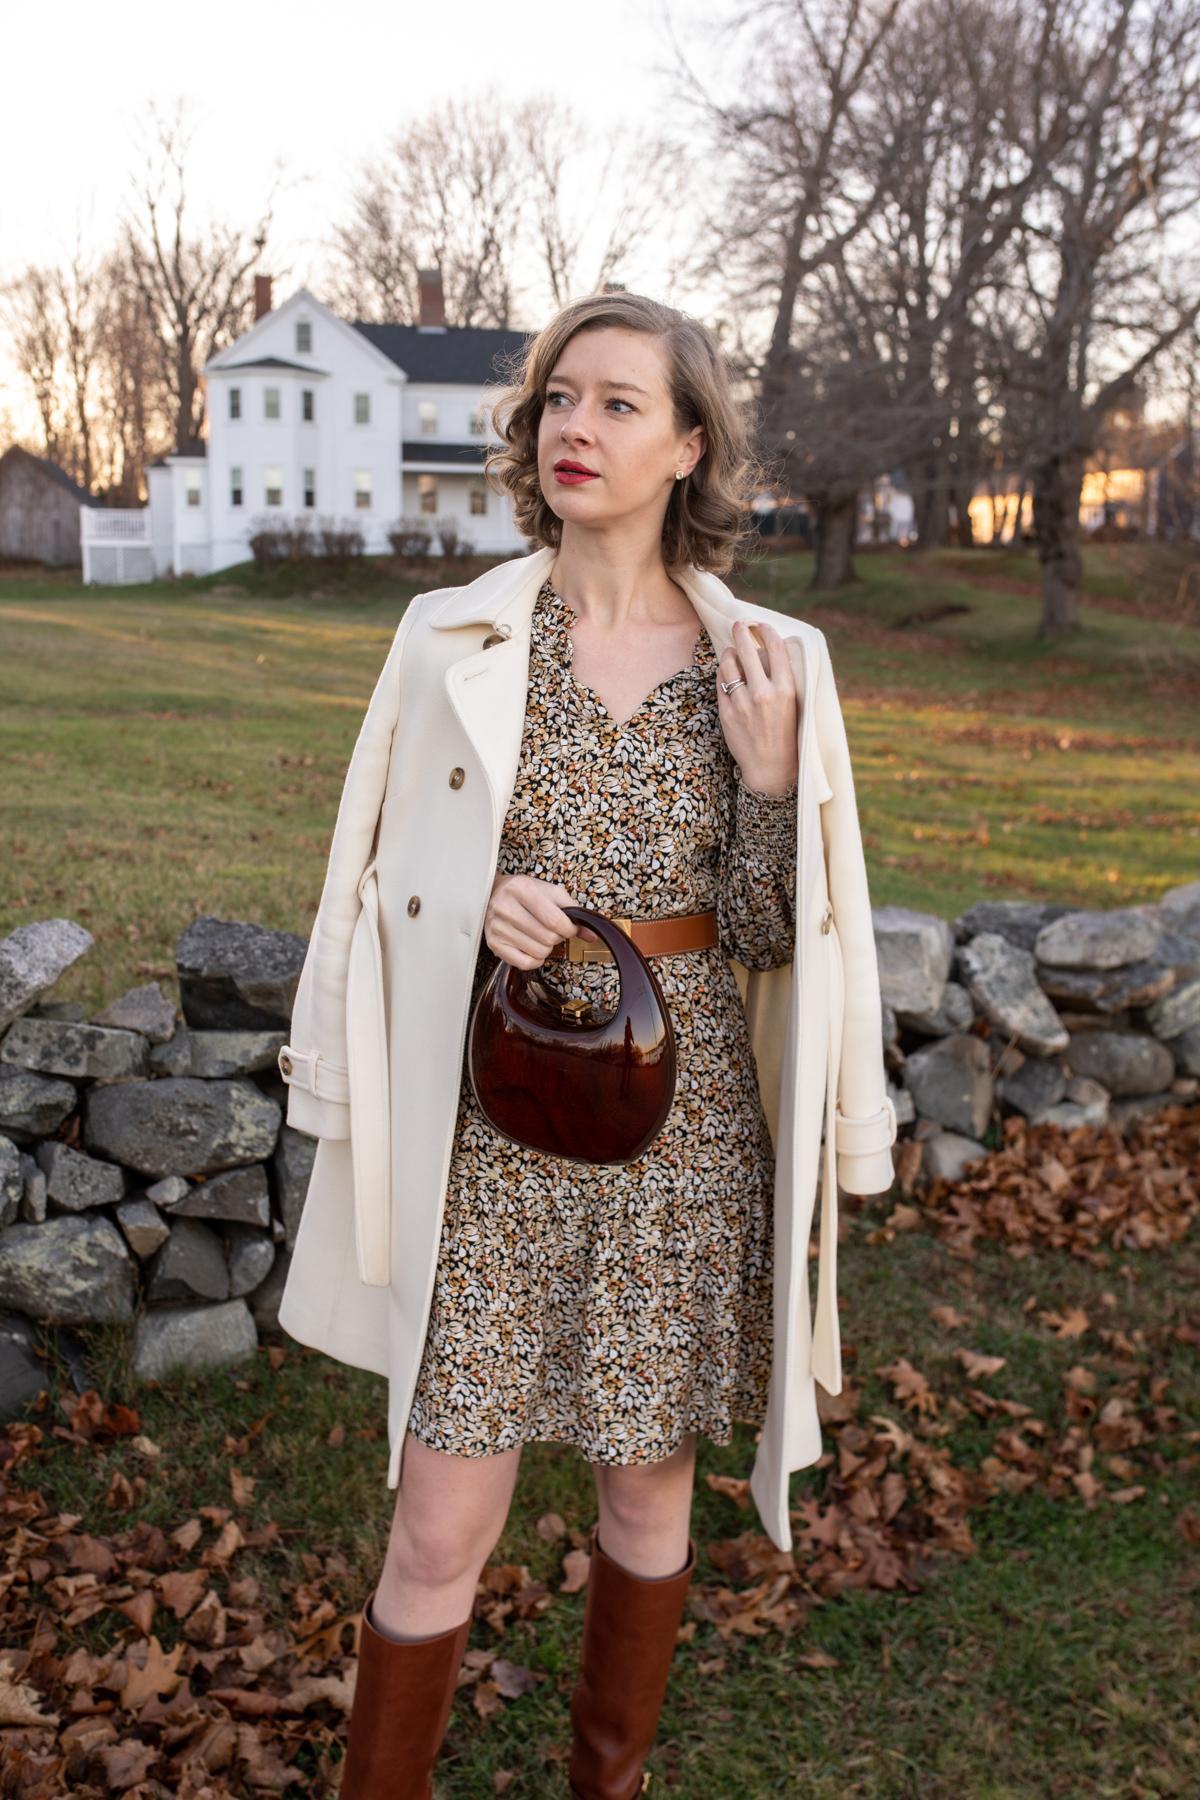 Stacie Flinner x Charlotte Brody Smocked Winterberry Dress-4.jpg